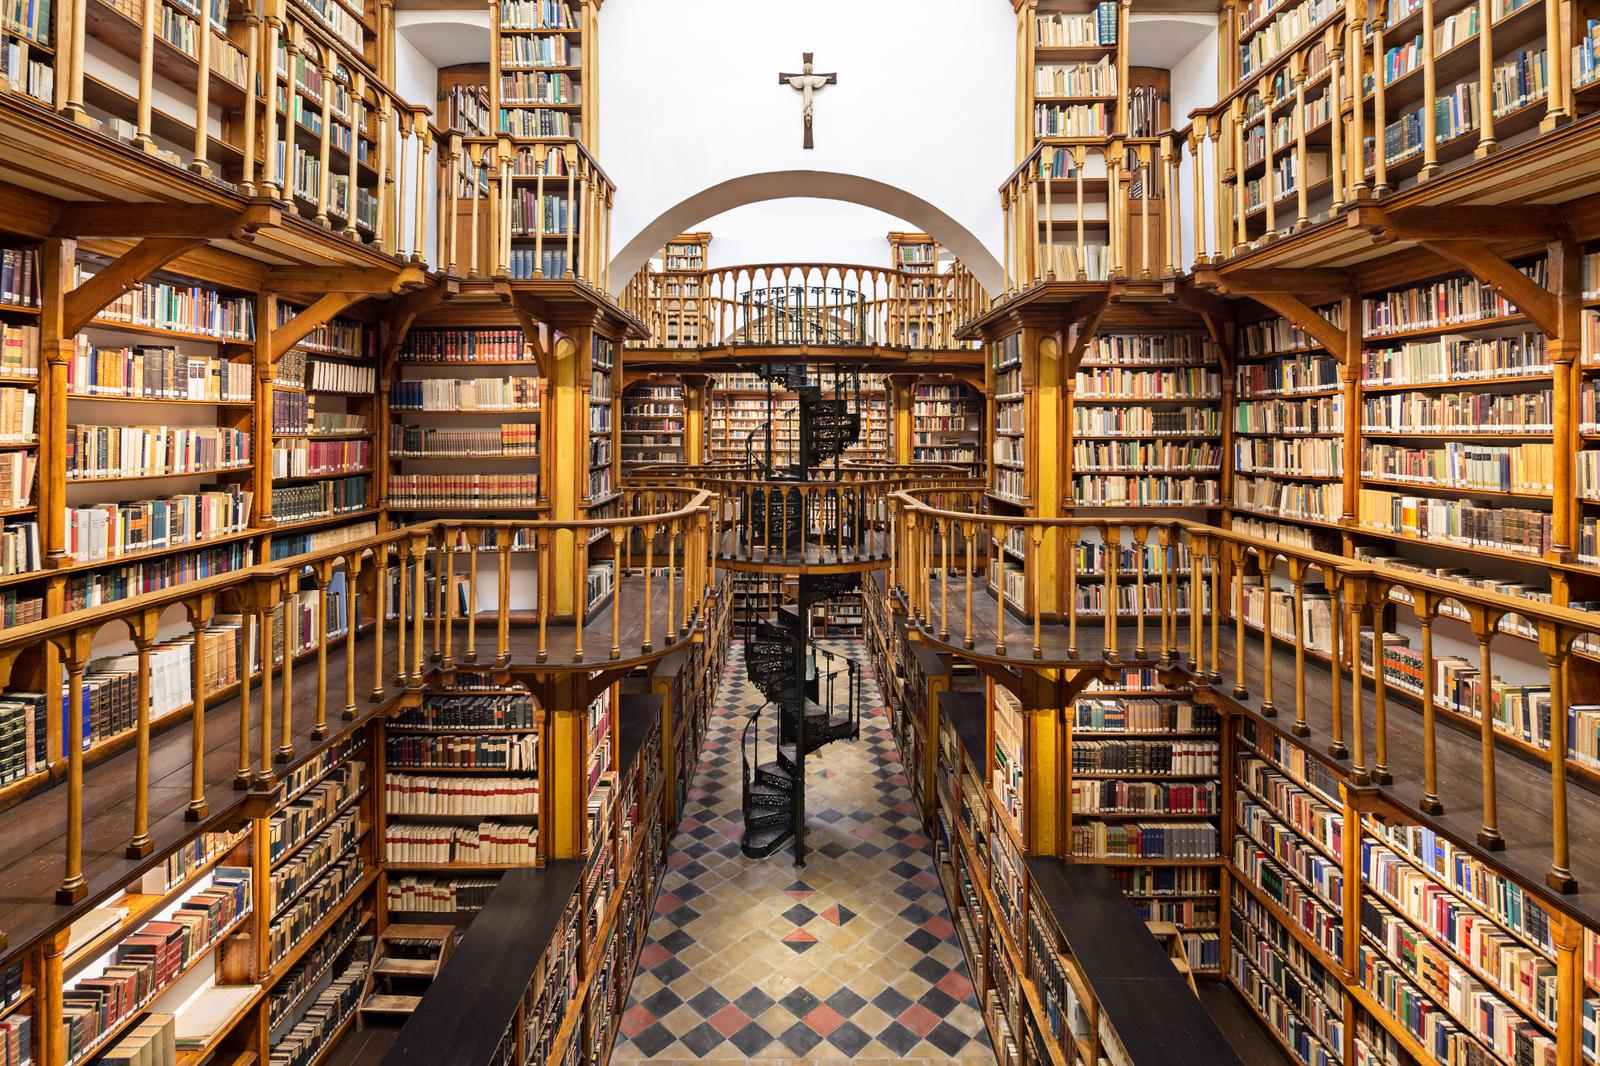 Bibliothek Benediktinerabtei Maria Laach